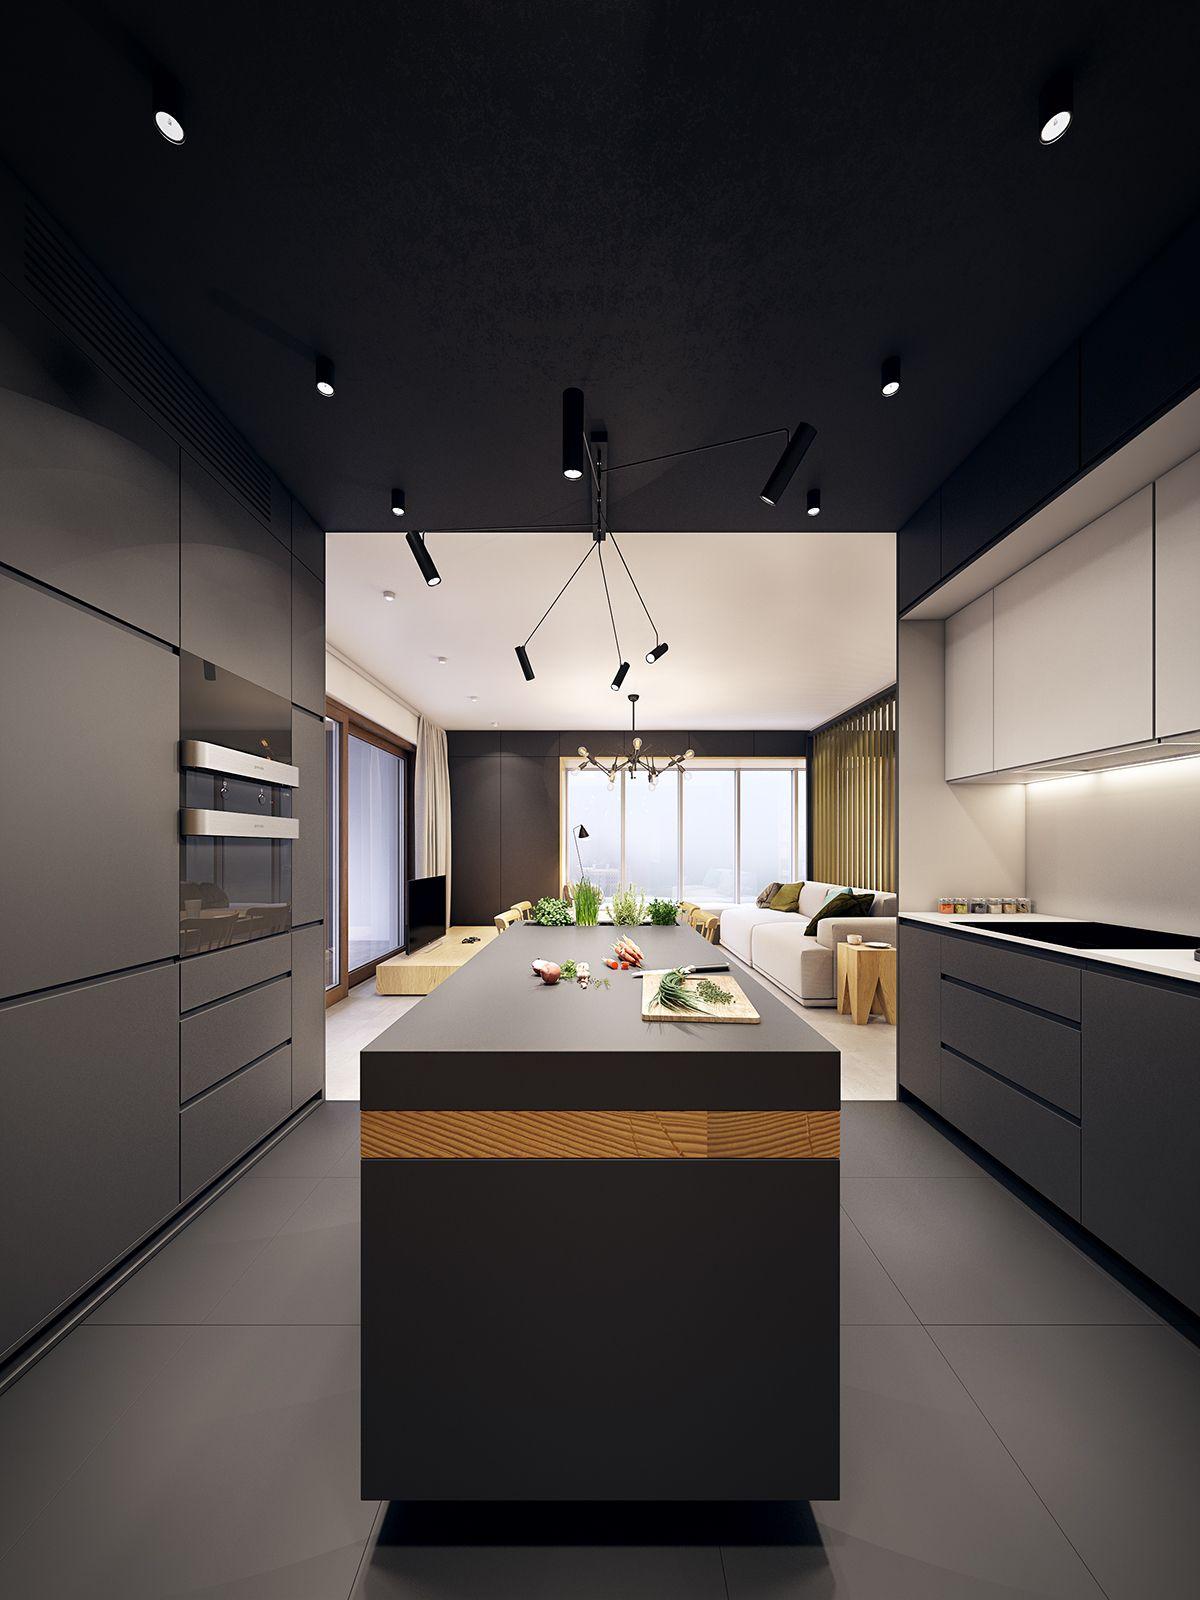 U S S Home Krak W On Behance Interior Ideas Pinterest  # Muebles Cocina Zelari Nuzzi